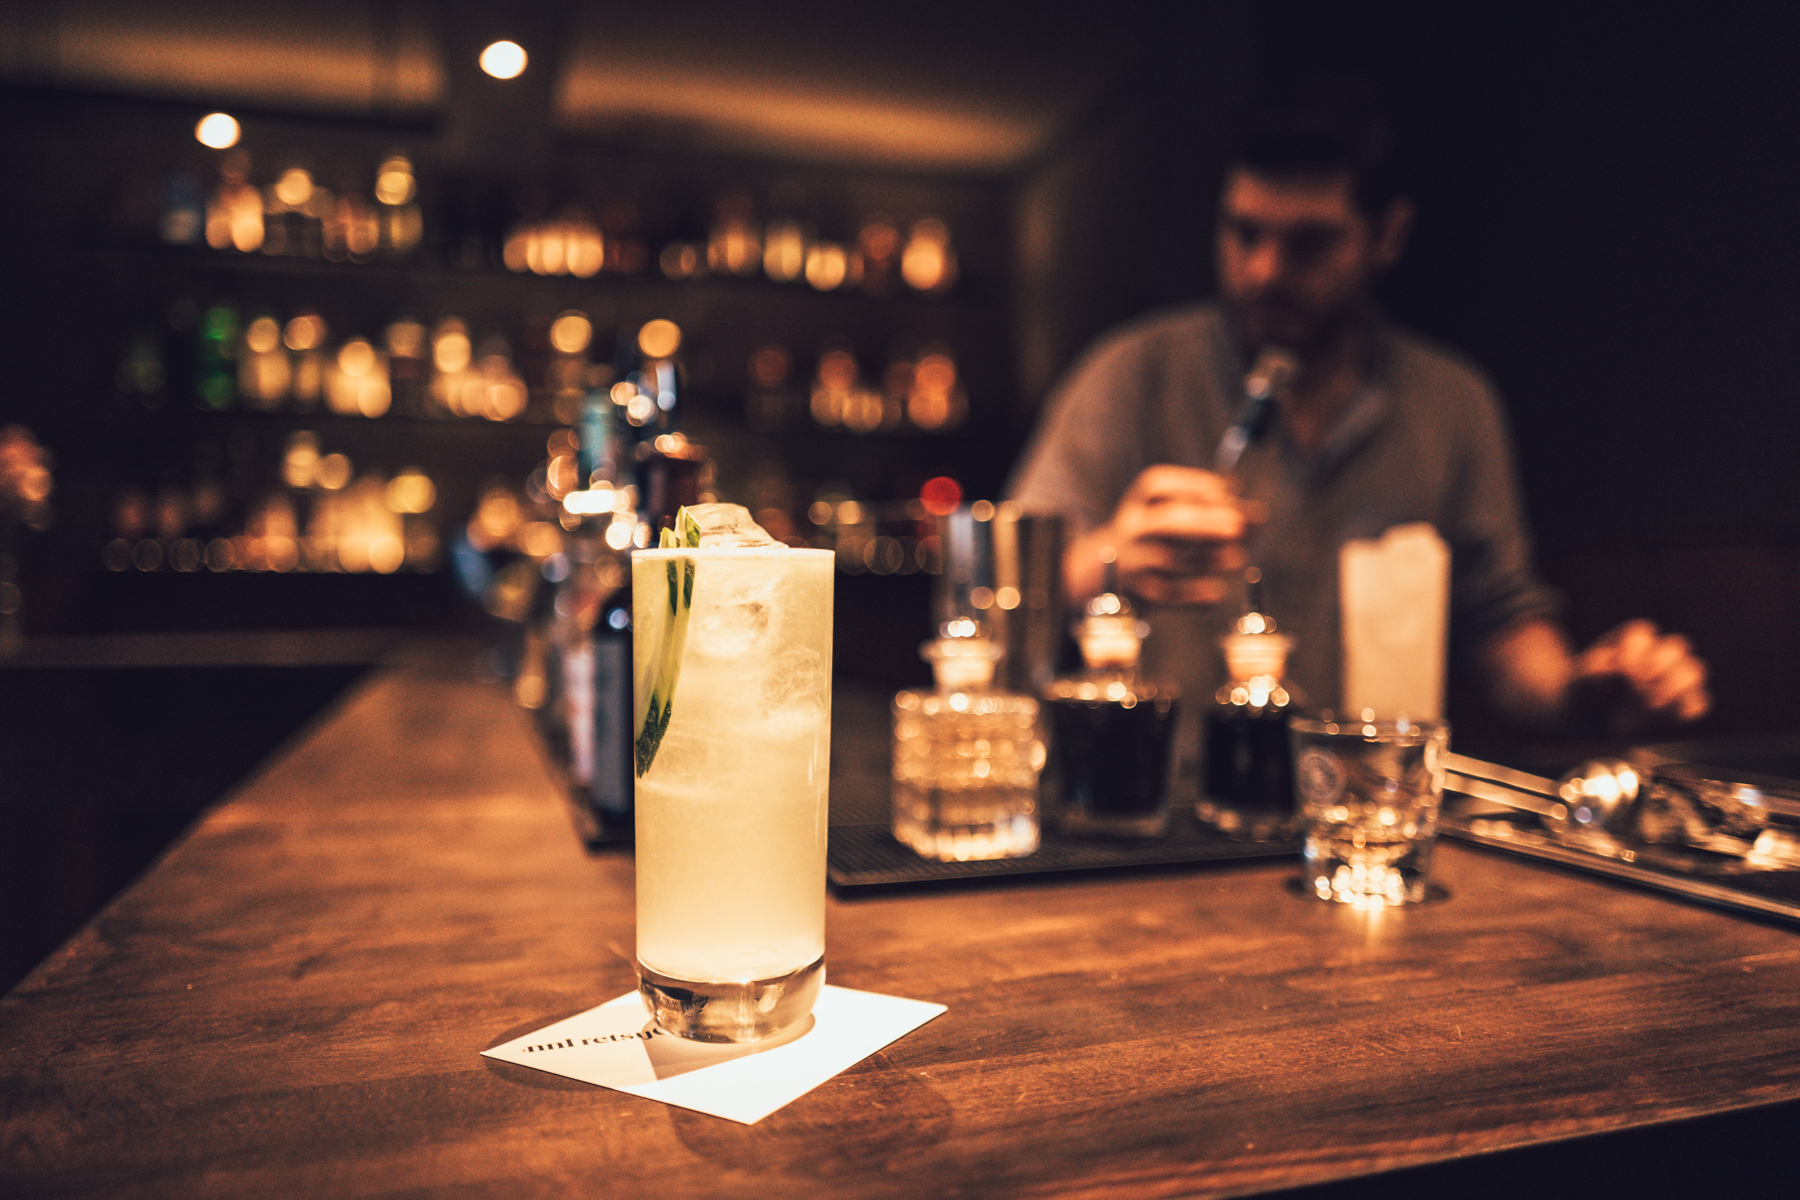 Geheimtipp Hamburg Altona Bar Tiny Oyster Inn Cristina Lopez 2